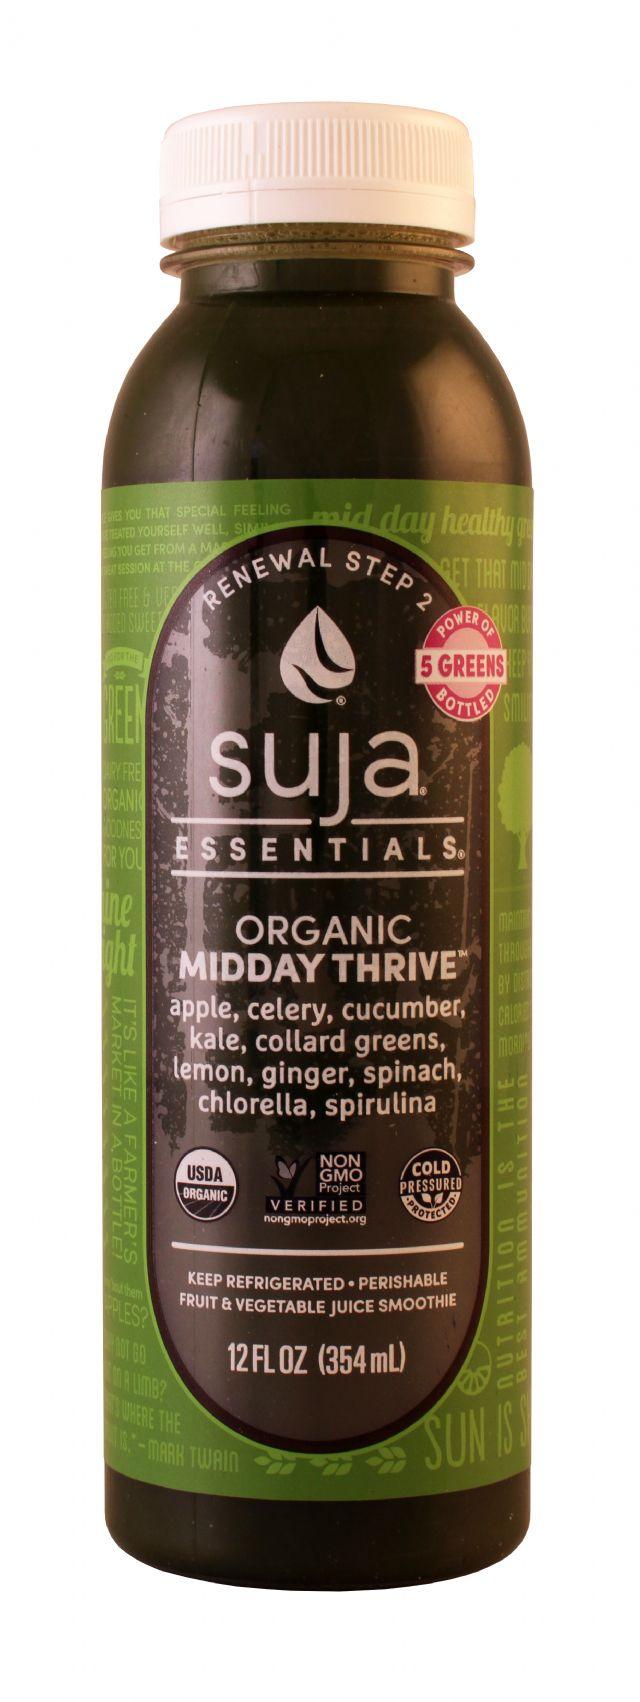 Suja Essentials: Suja Midday Fronty